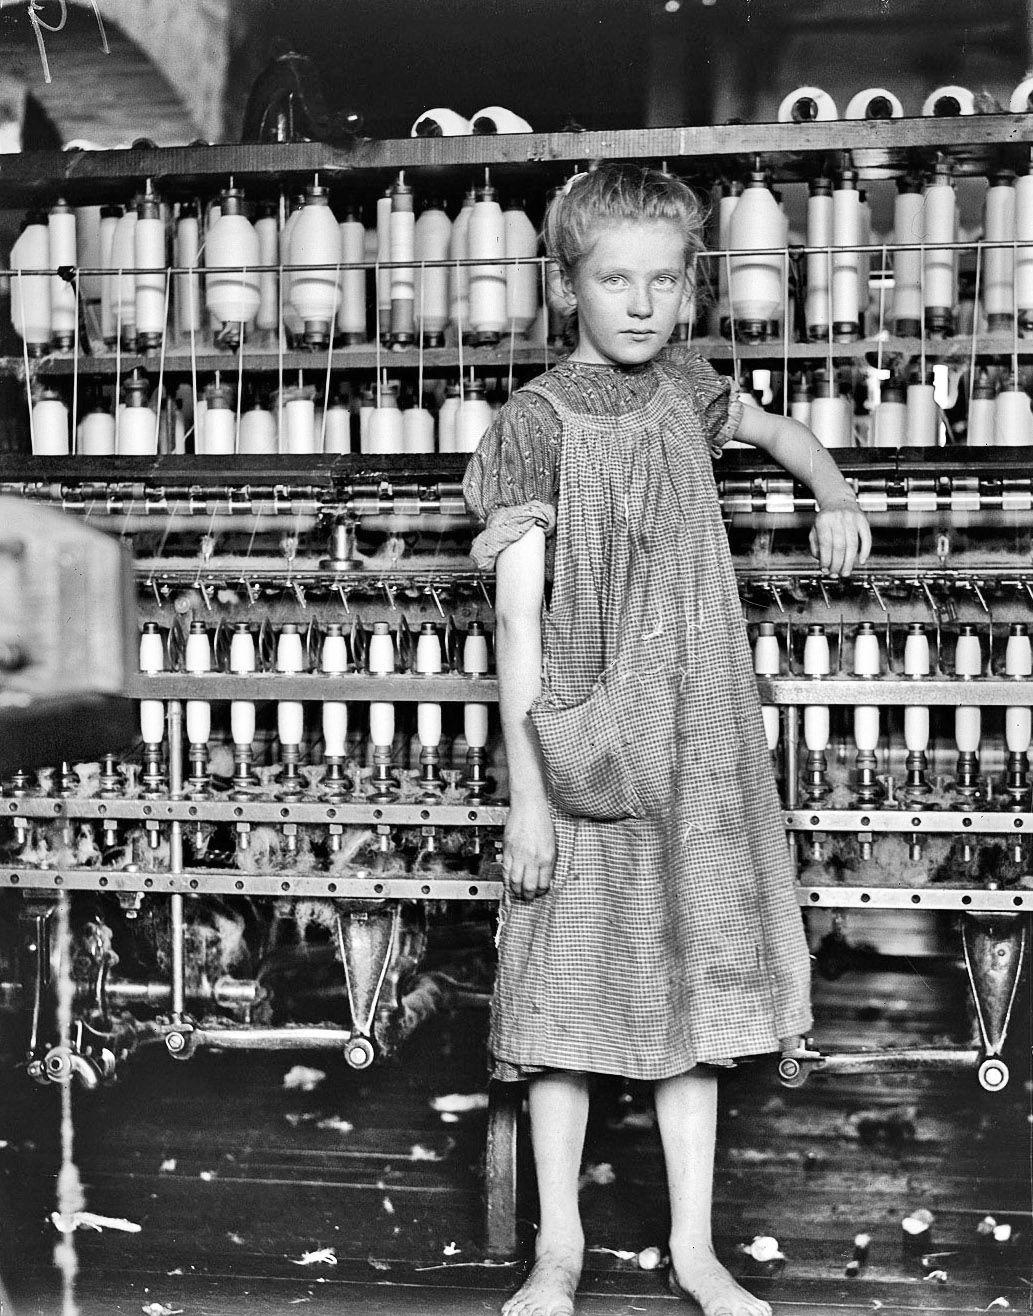 Chimney Sweep, before child labor laws | Fotografia, interesting ...